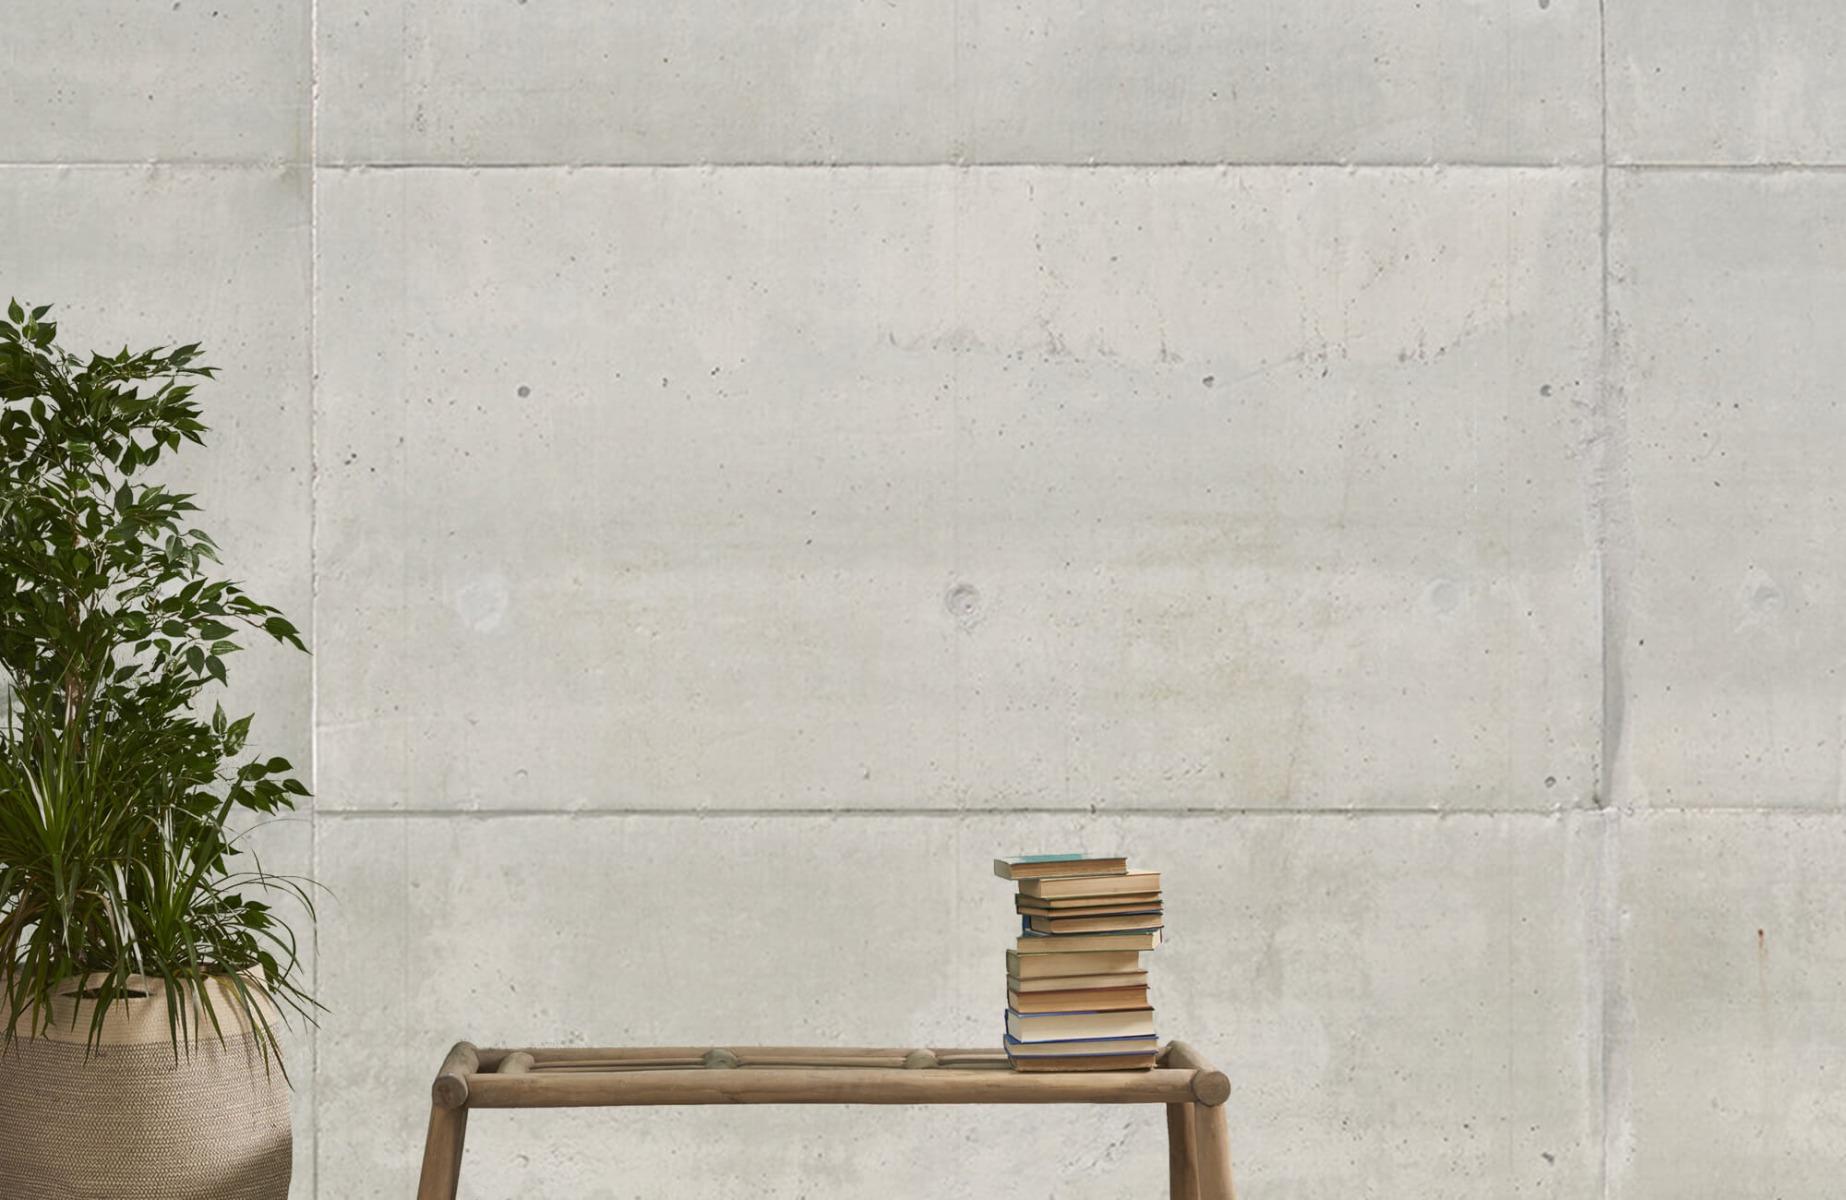 Betonlook behang - Betonnen platen - Wallexclusive - Vergaderruimte 1